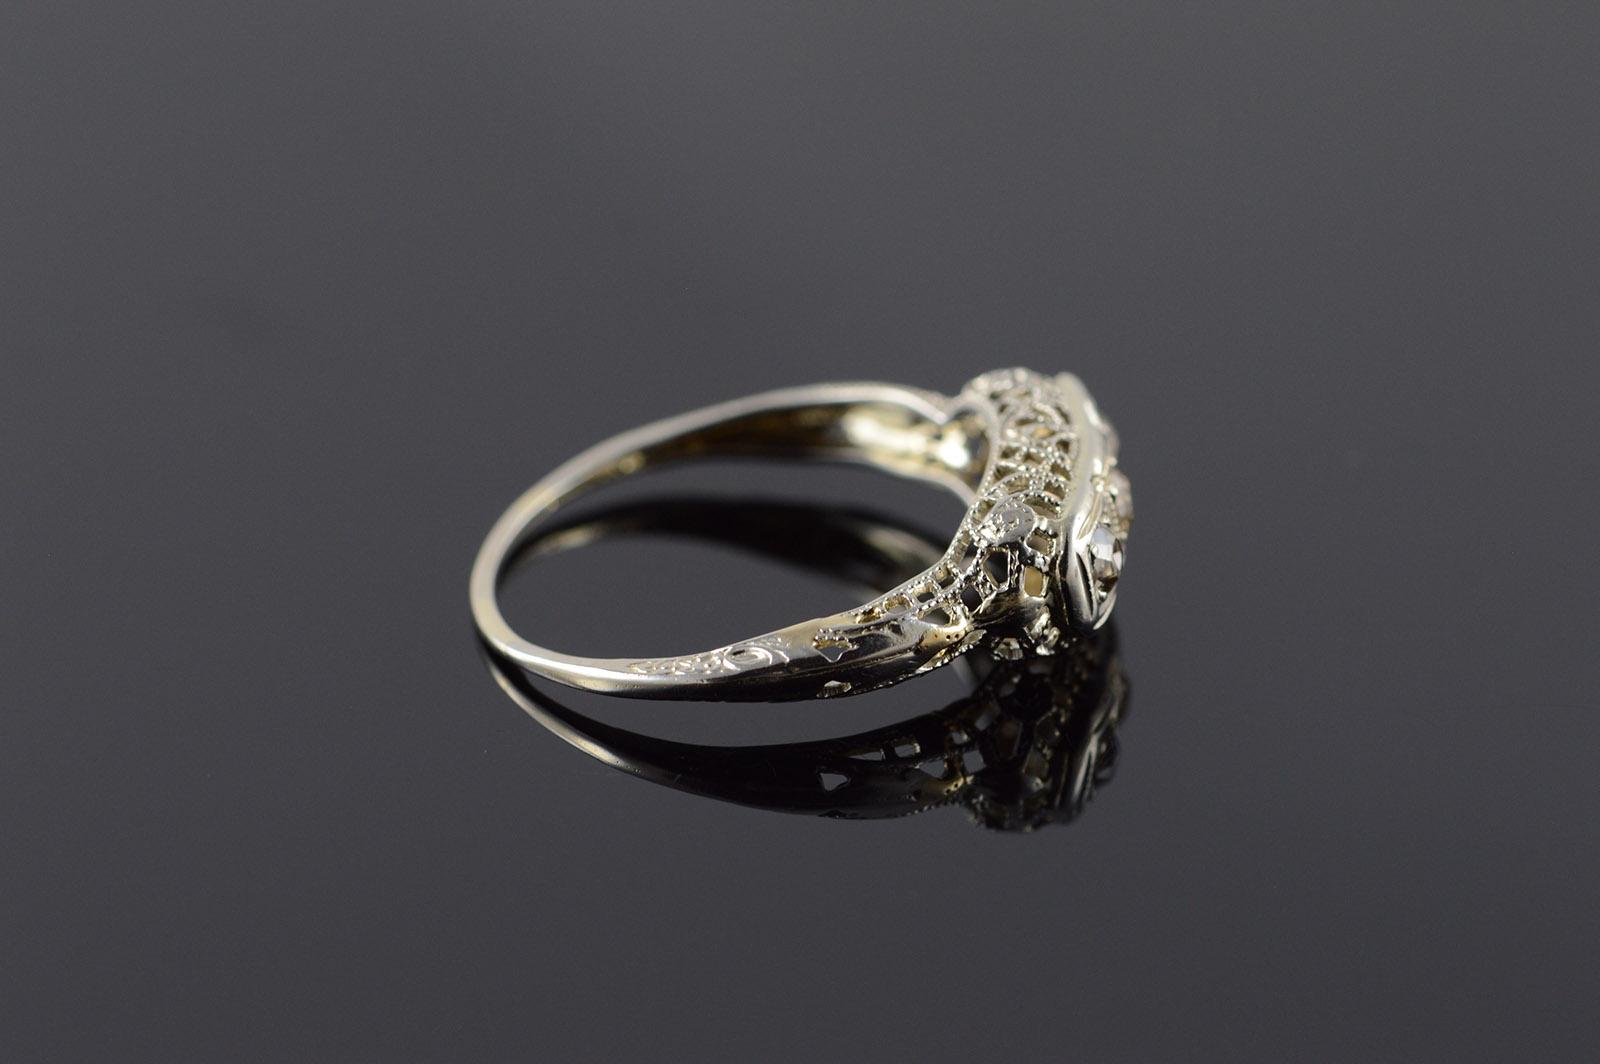 filigree wedding band wedding ring for filigree wedding band zoom